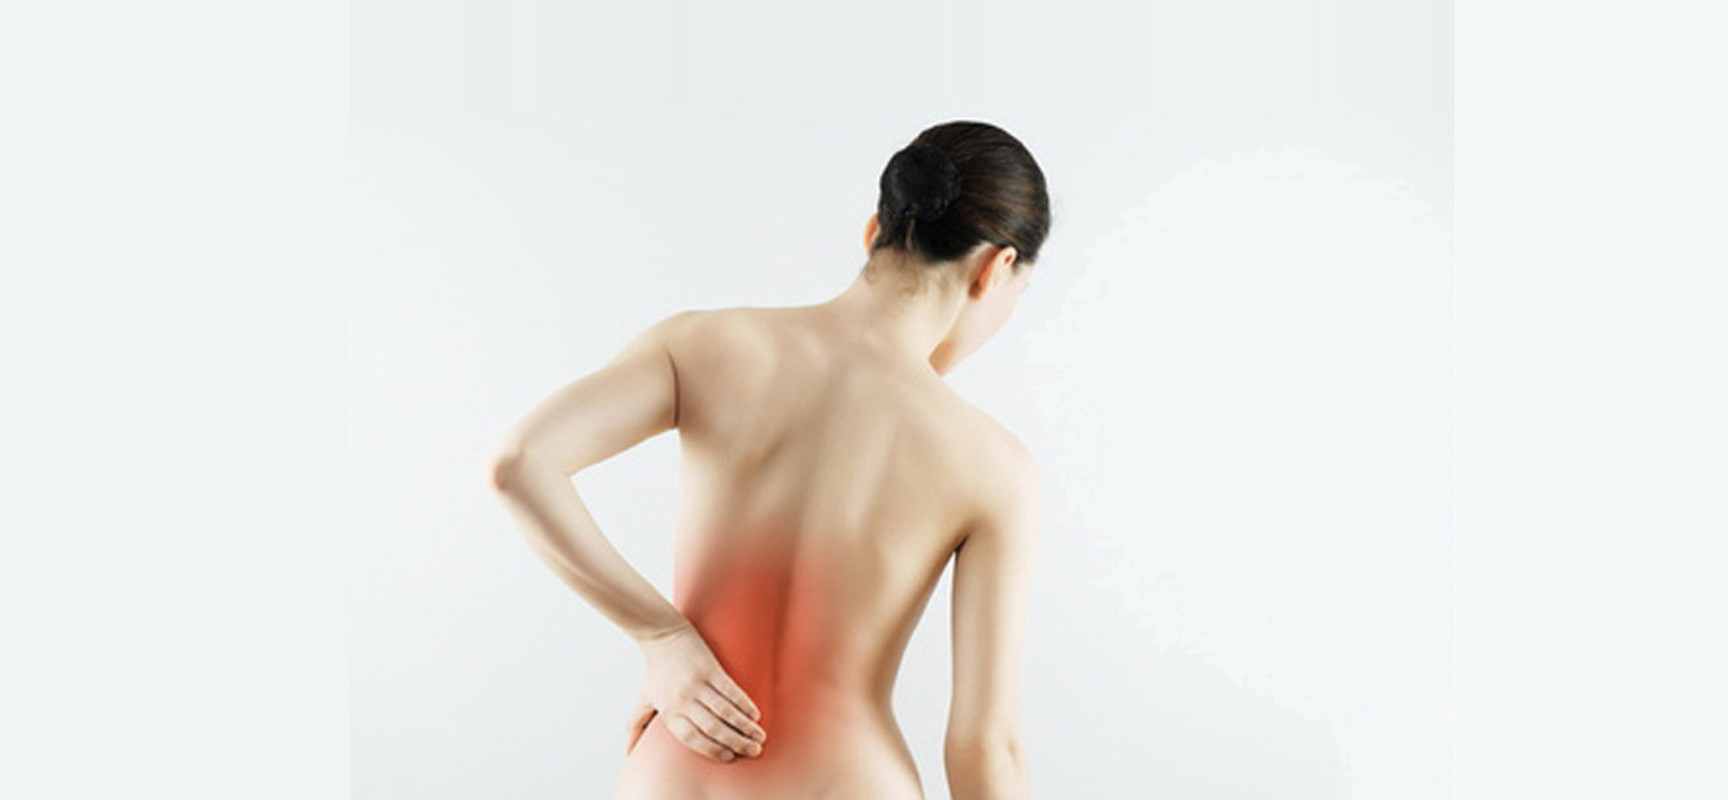 Spondilodisplaziya del departamento de pecho de la columna vertebral